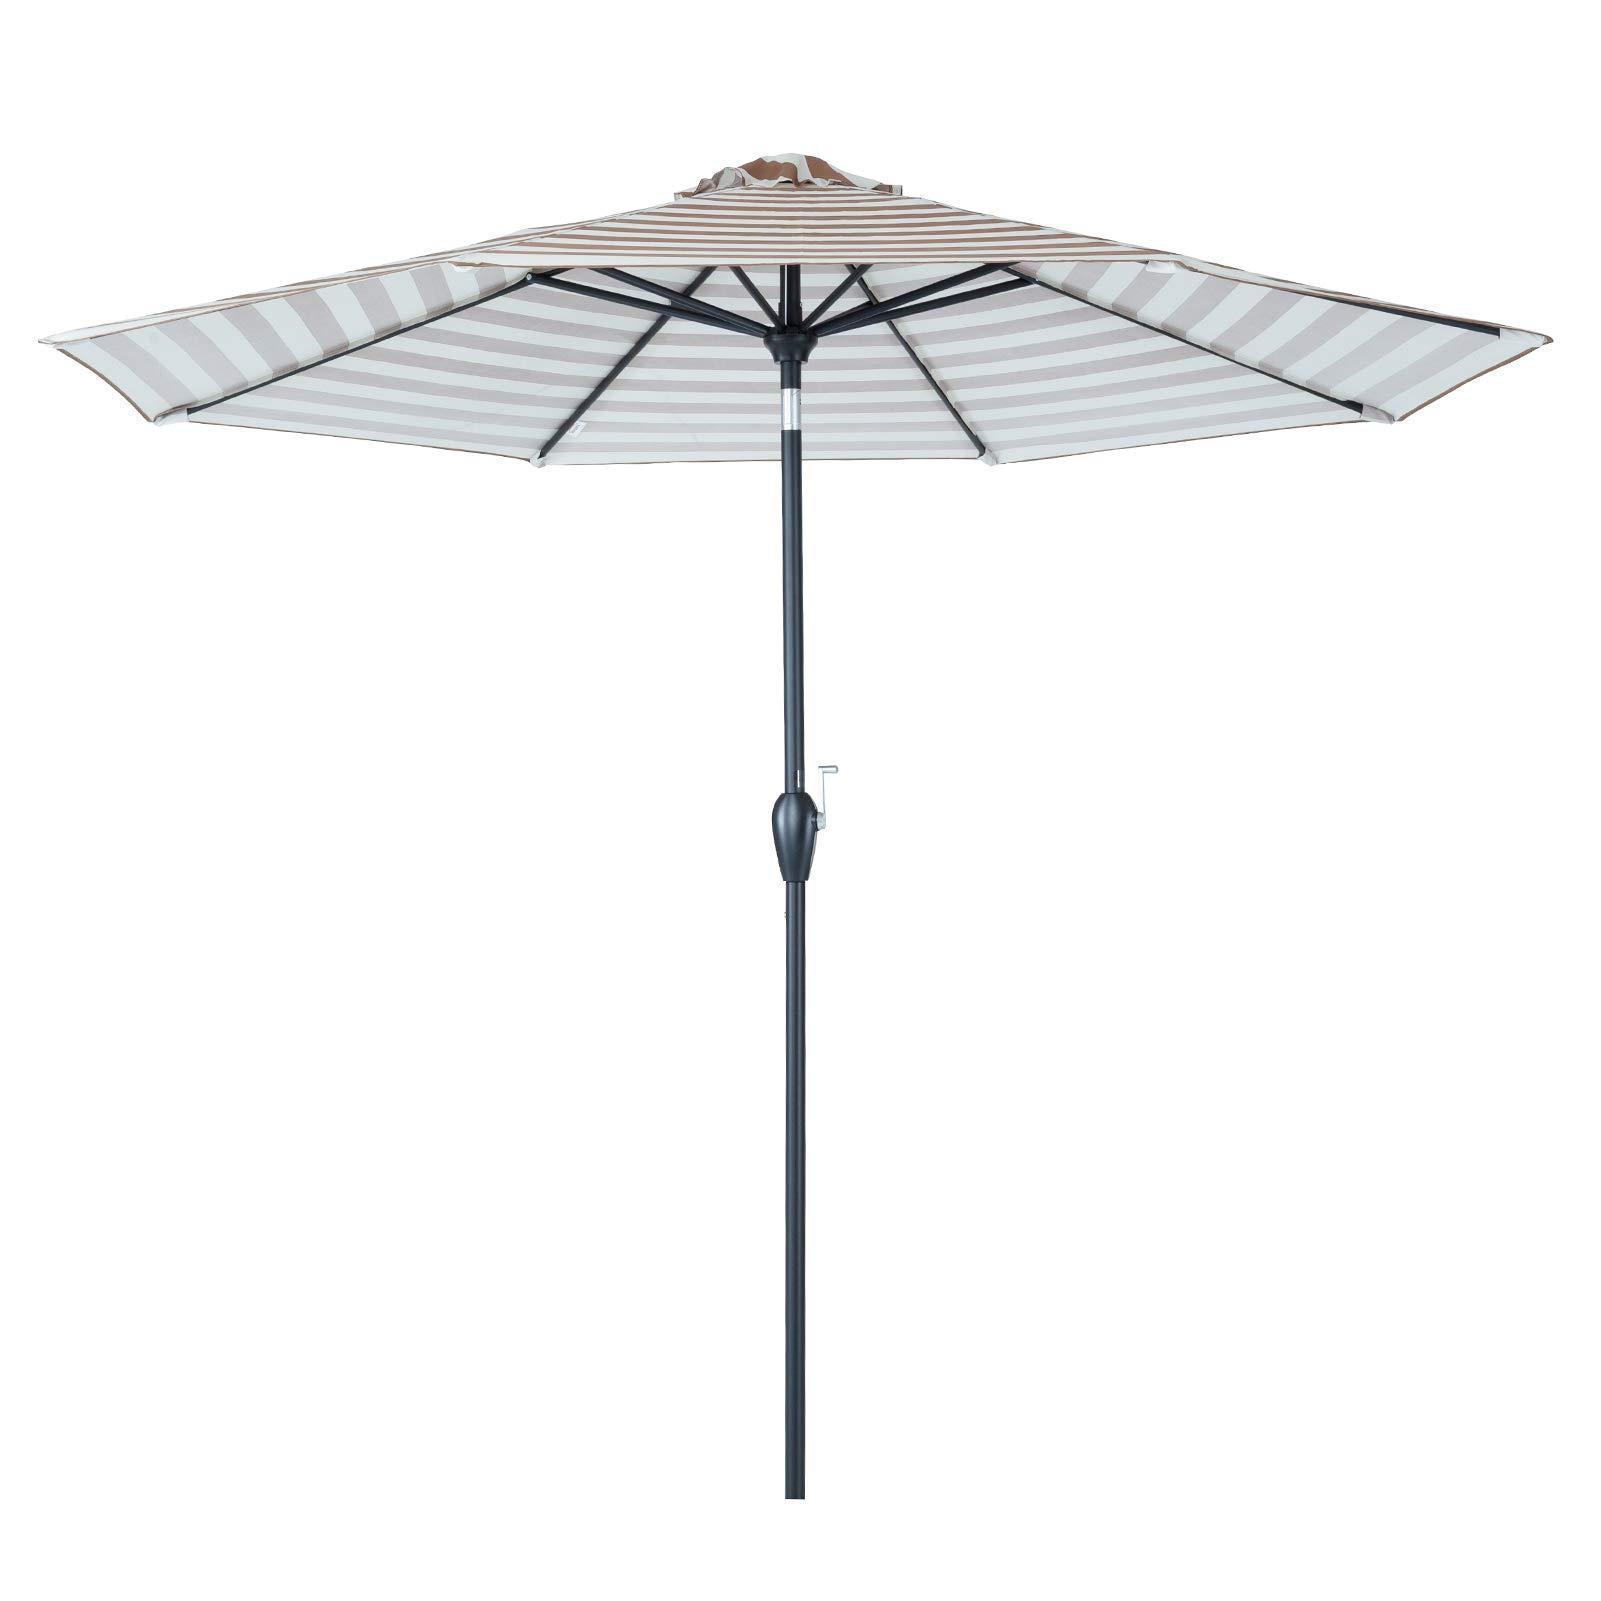 Tempera 9 ft Auto-Tilt Patio Umbrella Outdoor Table Umbrella, 8 Steel Ribs, Beige Taupe Stripe